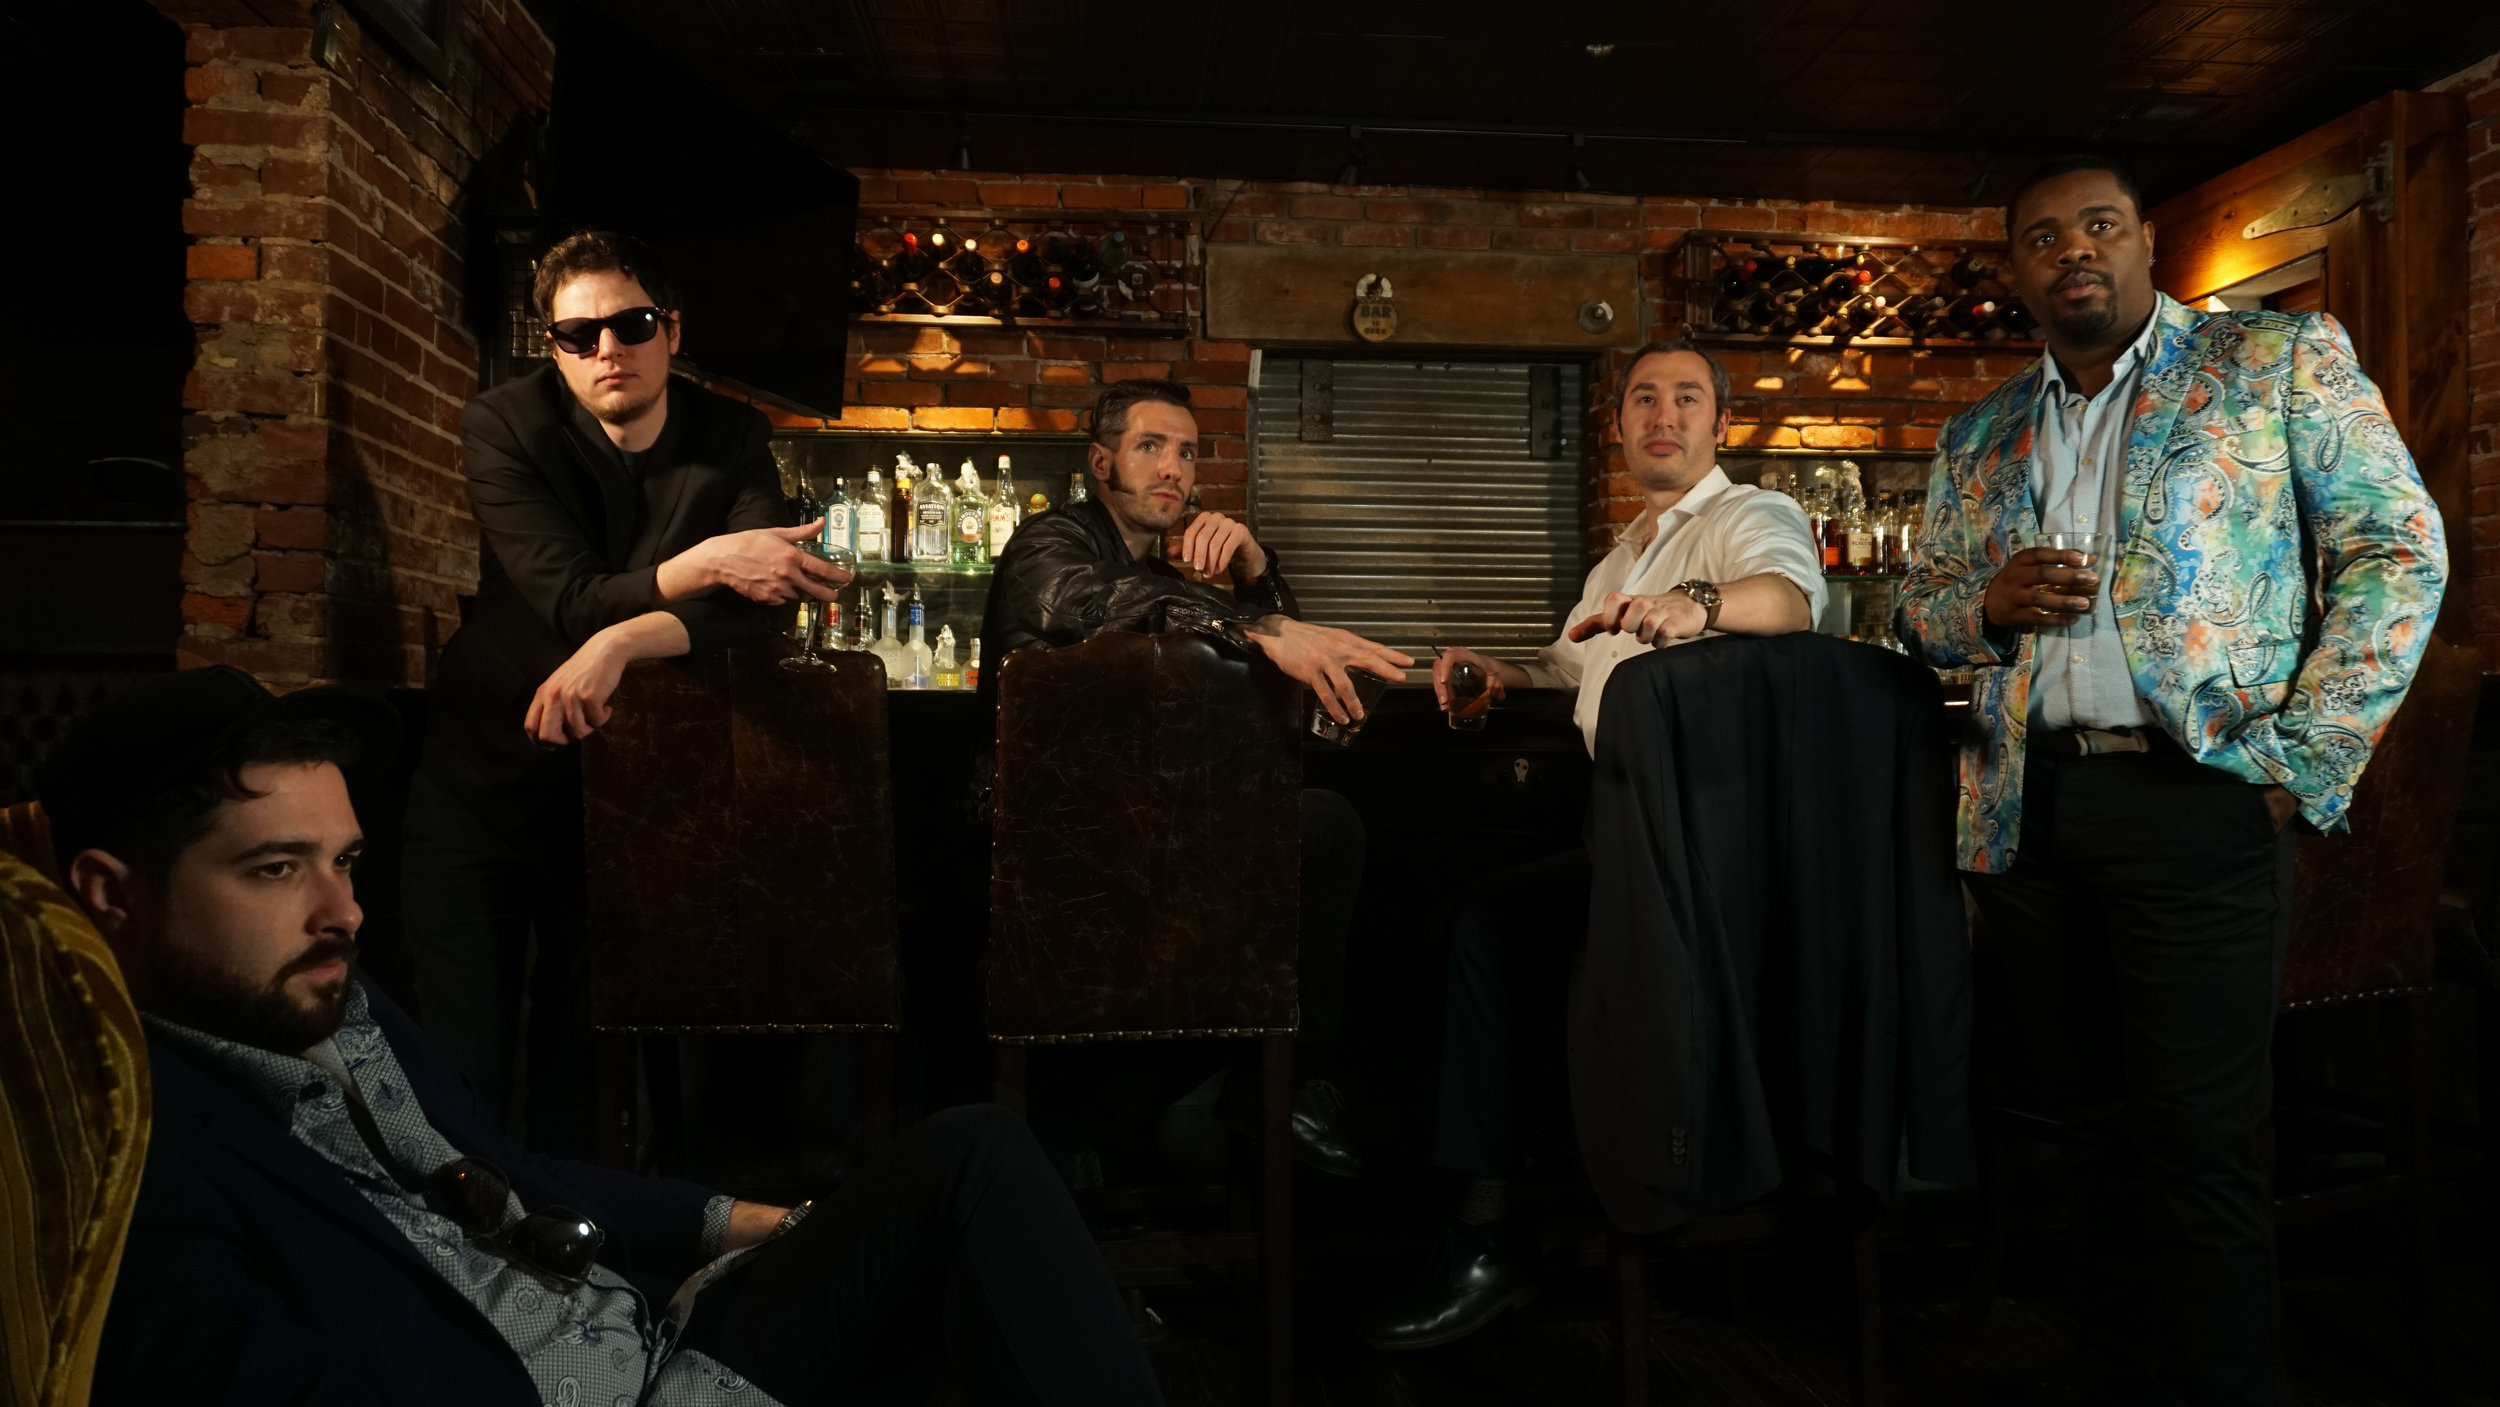 - Rob Peace - lead vocalsJackie Ooze - rhythmic guitarChristian Gunn - lead guitarBrandy Porter - bassSticky Vinny - drums